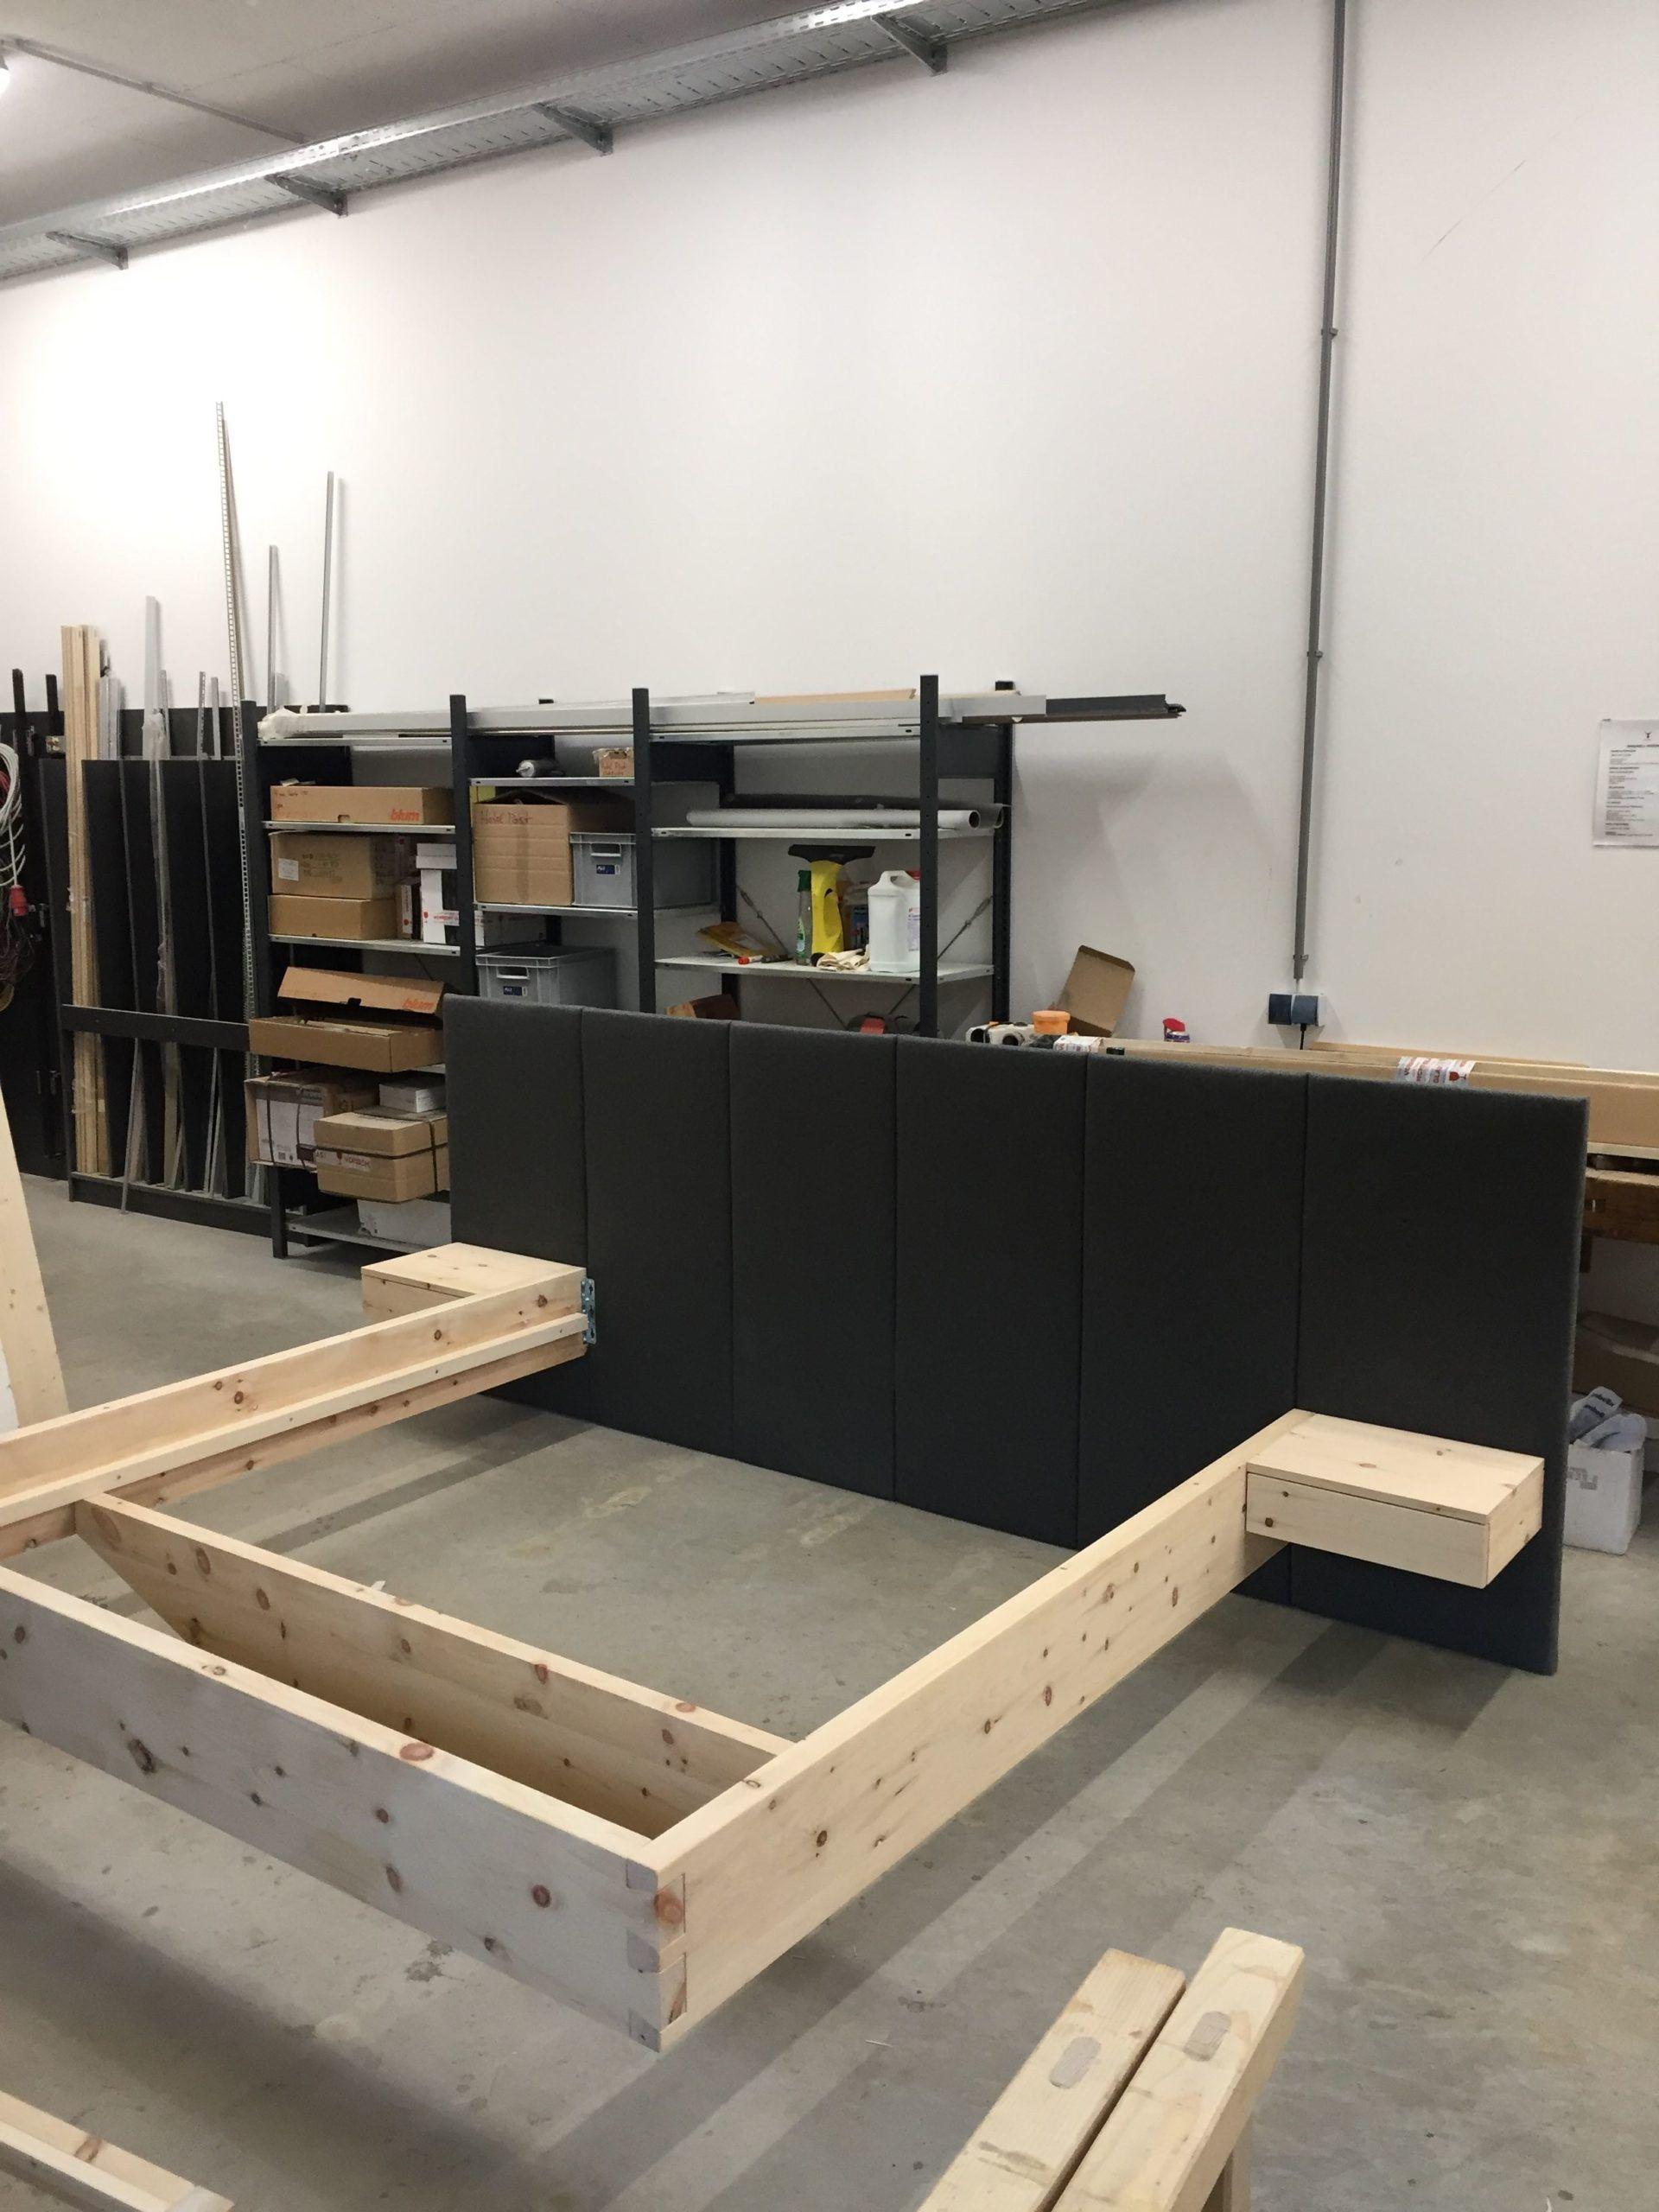 Kiefernbett Quot Laura Quot Kopflast Indirekte Led Beleuchtung Briefkasten Ohne M In 2020 Bed Furniture Design Wood Bed Design Bed Frame Design